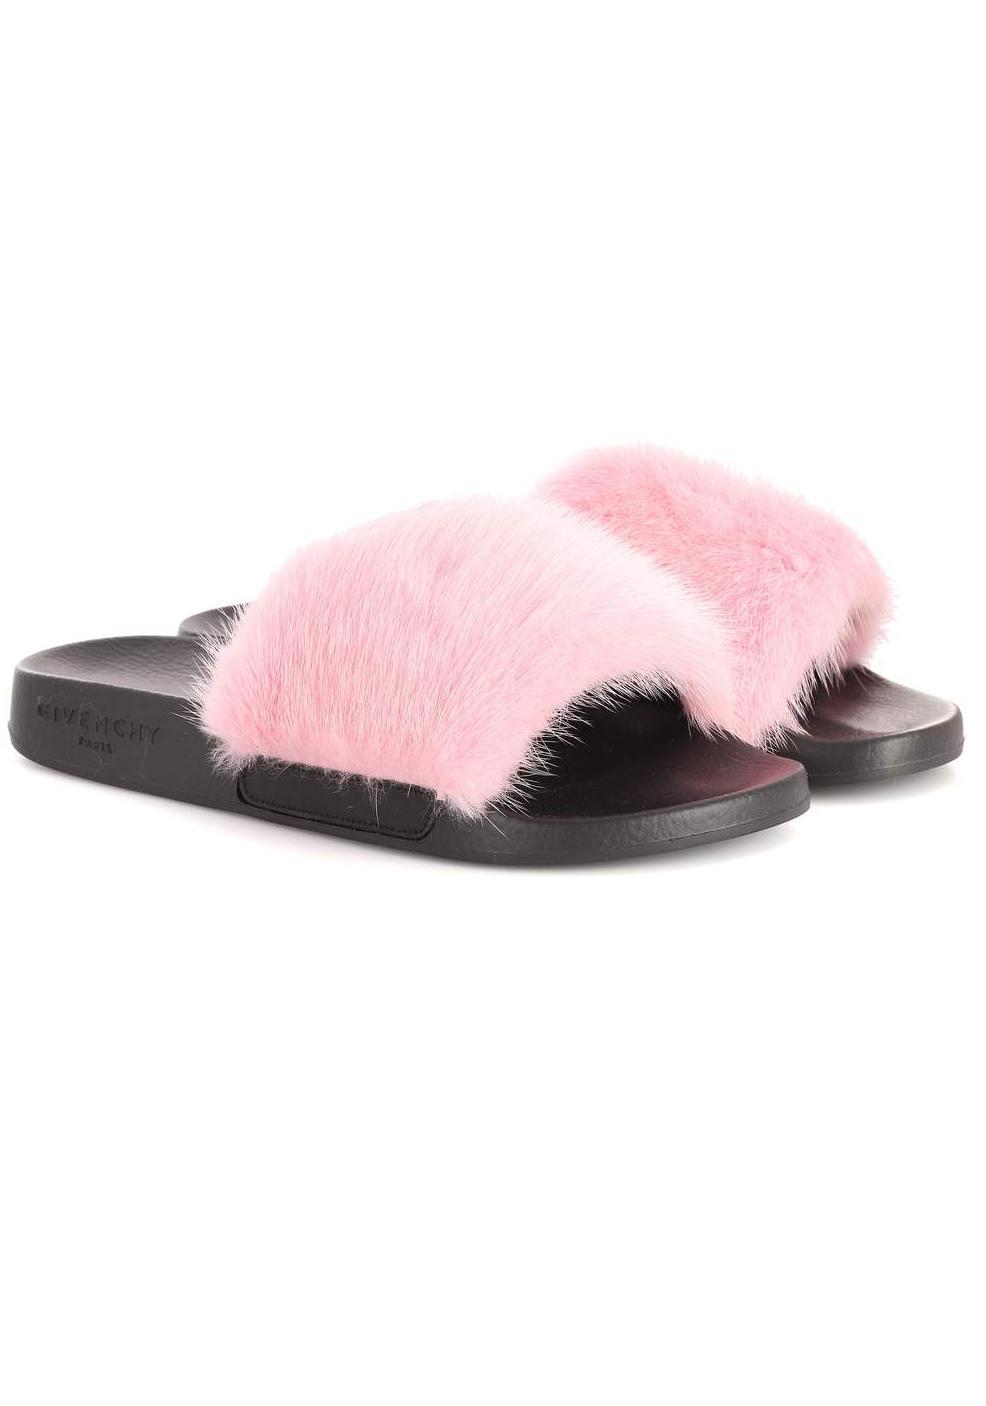 Fur slides Givenchy, mytheresa, €473